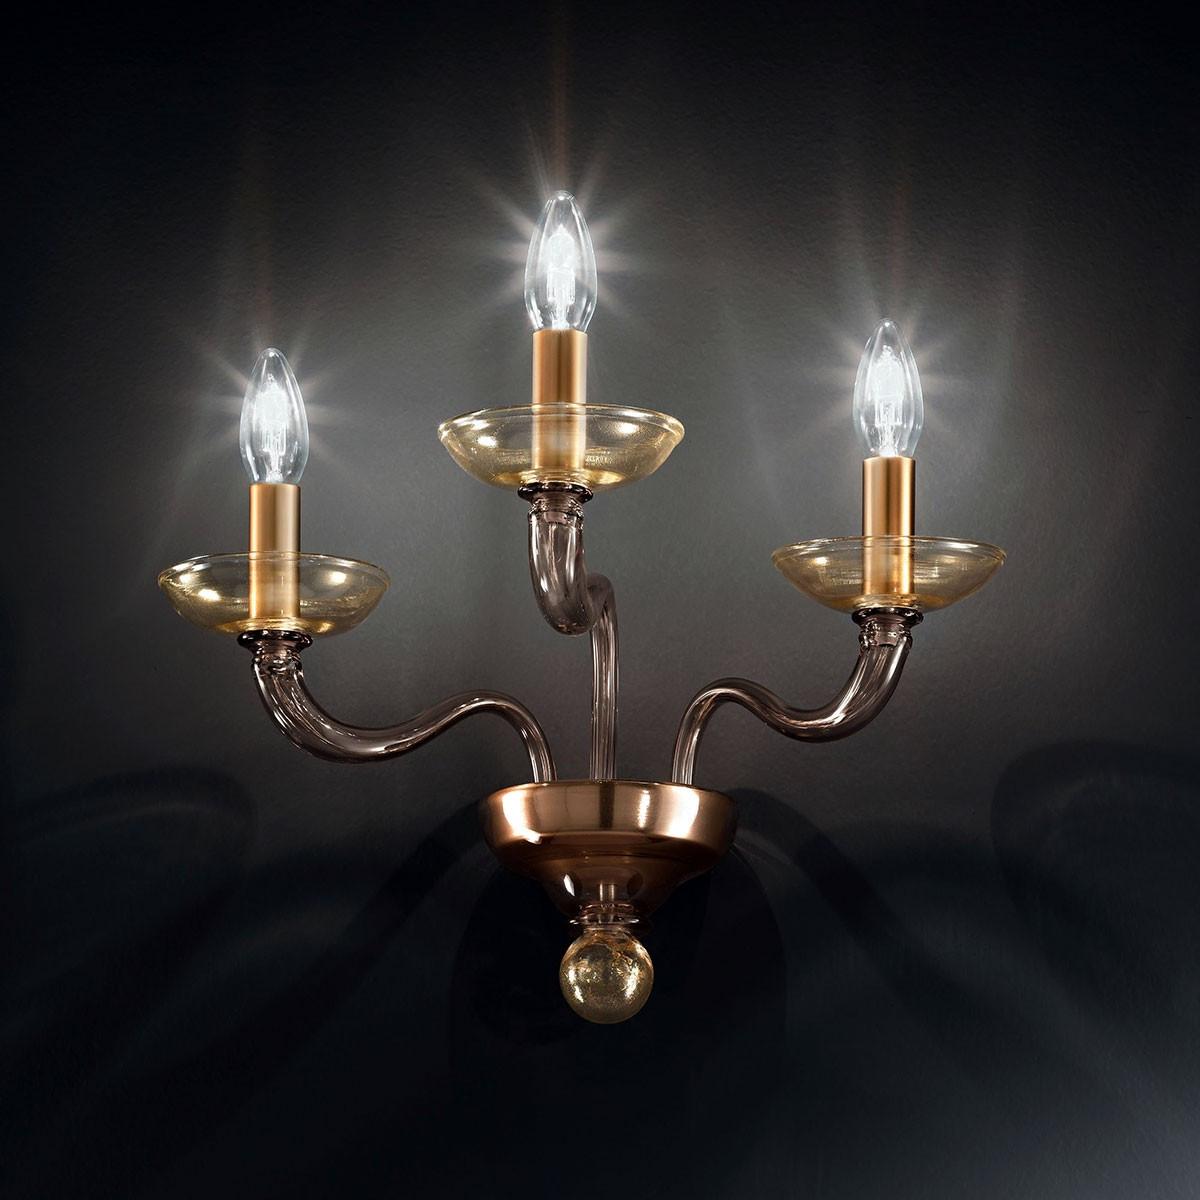 """Tibaldo"" aplique de pared de Murano - 3 luces - gris y oro"